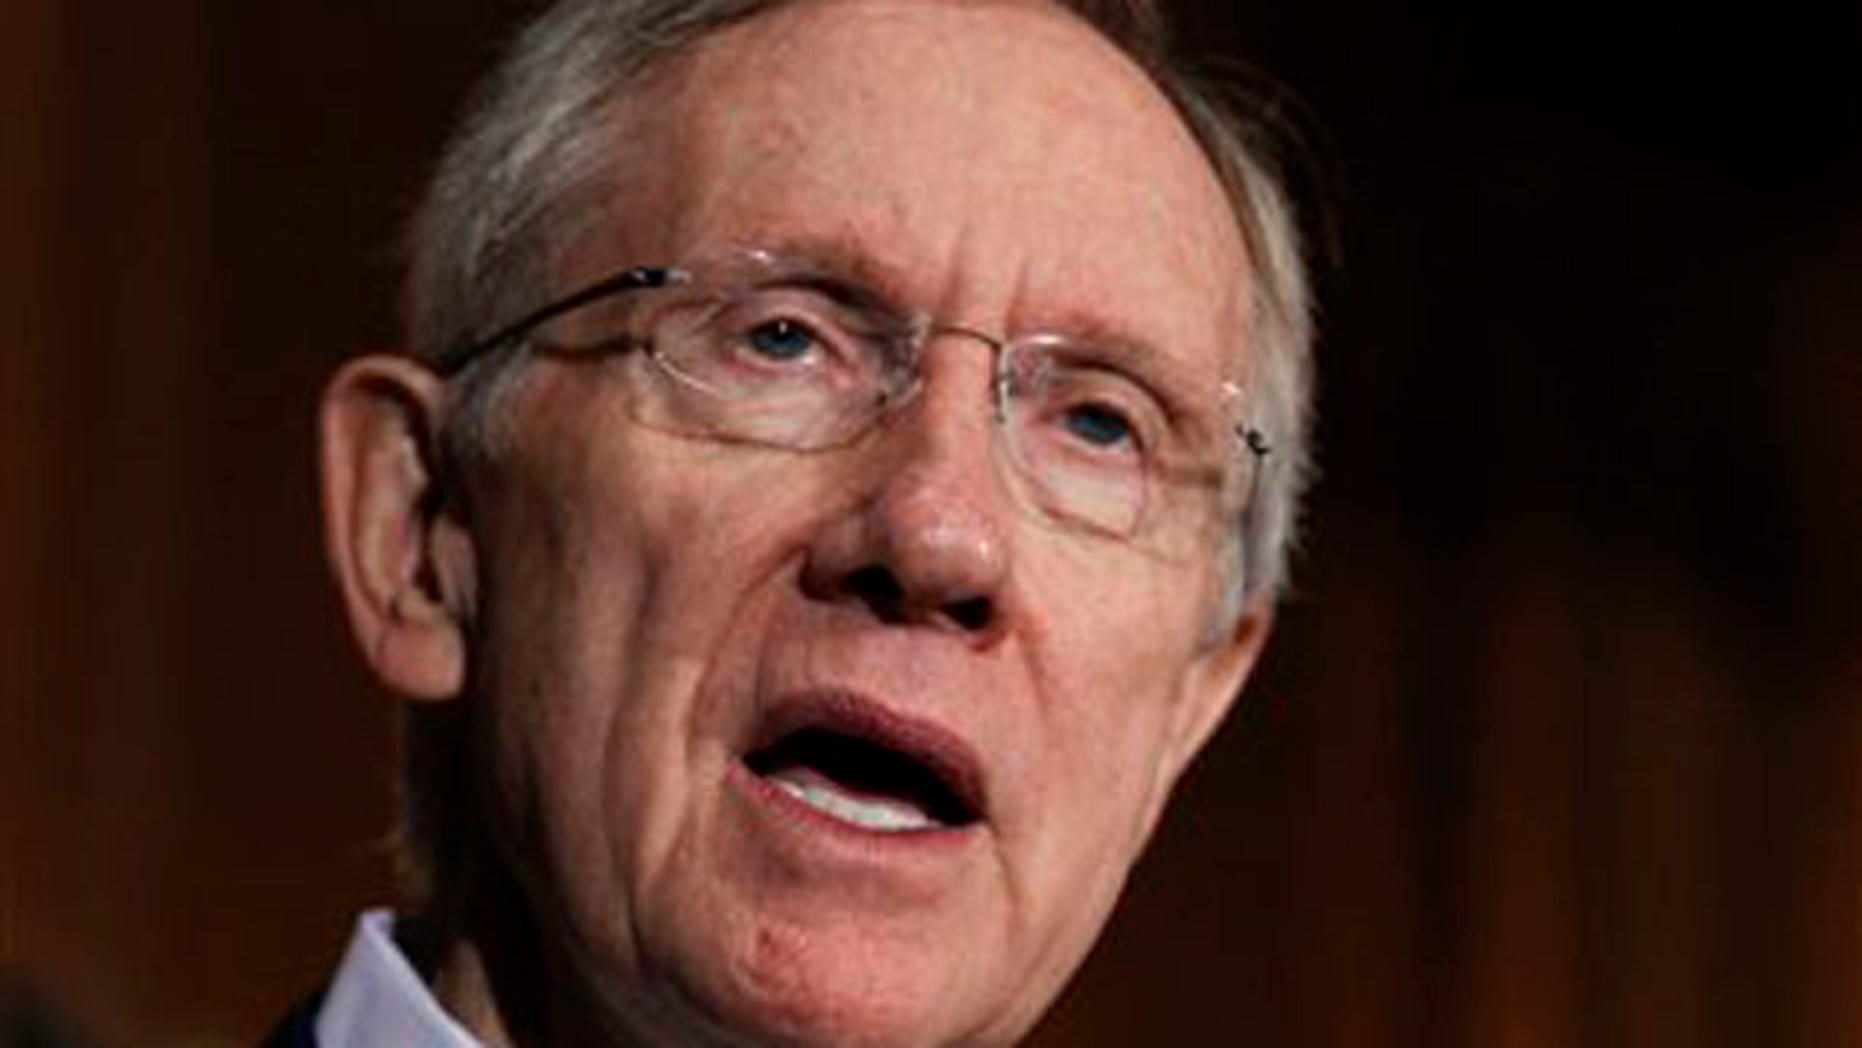 In this Aug. 5 photo, Senate Majority Leader Harry Reid speaks on Capitol Hill. (AP Photo)